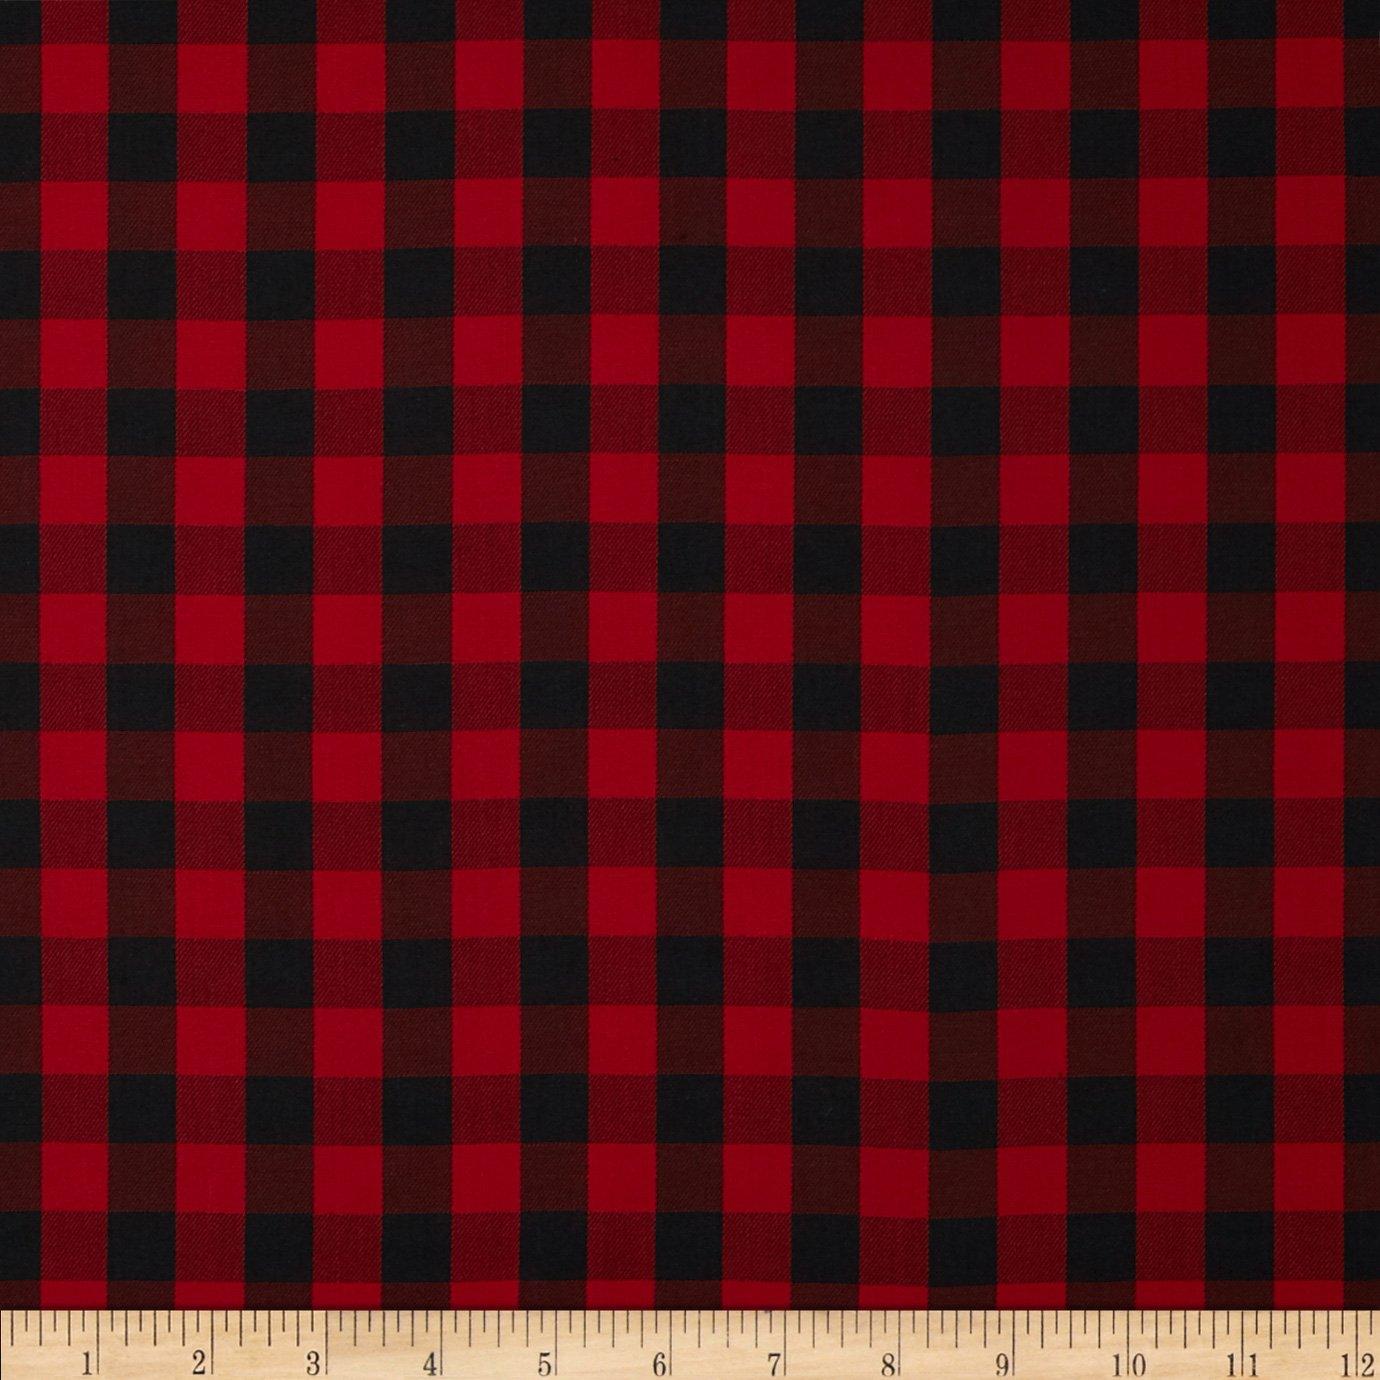 Robert Kaufman House of Wales Lawn Plaid Red Fabric by The Yard Kaufman Fabrics 0385169